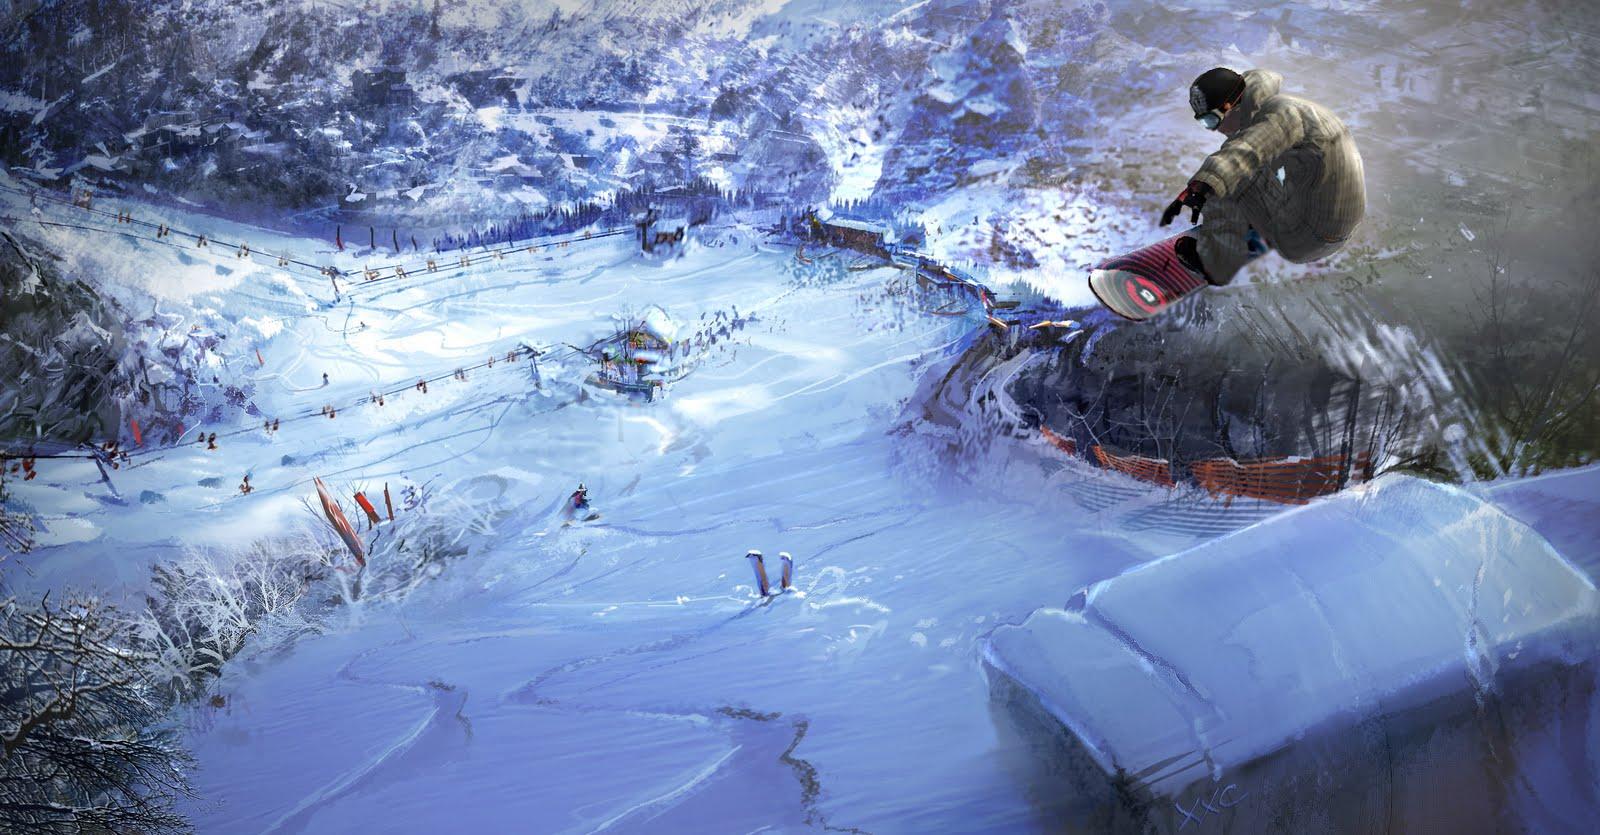 http://1.bp.blogspot.com/-qPRzfzLEfJY/TcnjNUgSgLI/AAAAAAAAAC4/c1C1i2yvxPU/s1600/shaun-white-snowboarding-wallpaper.jpg